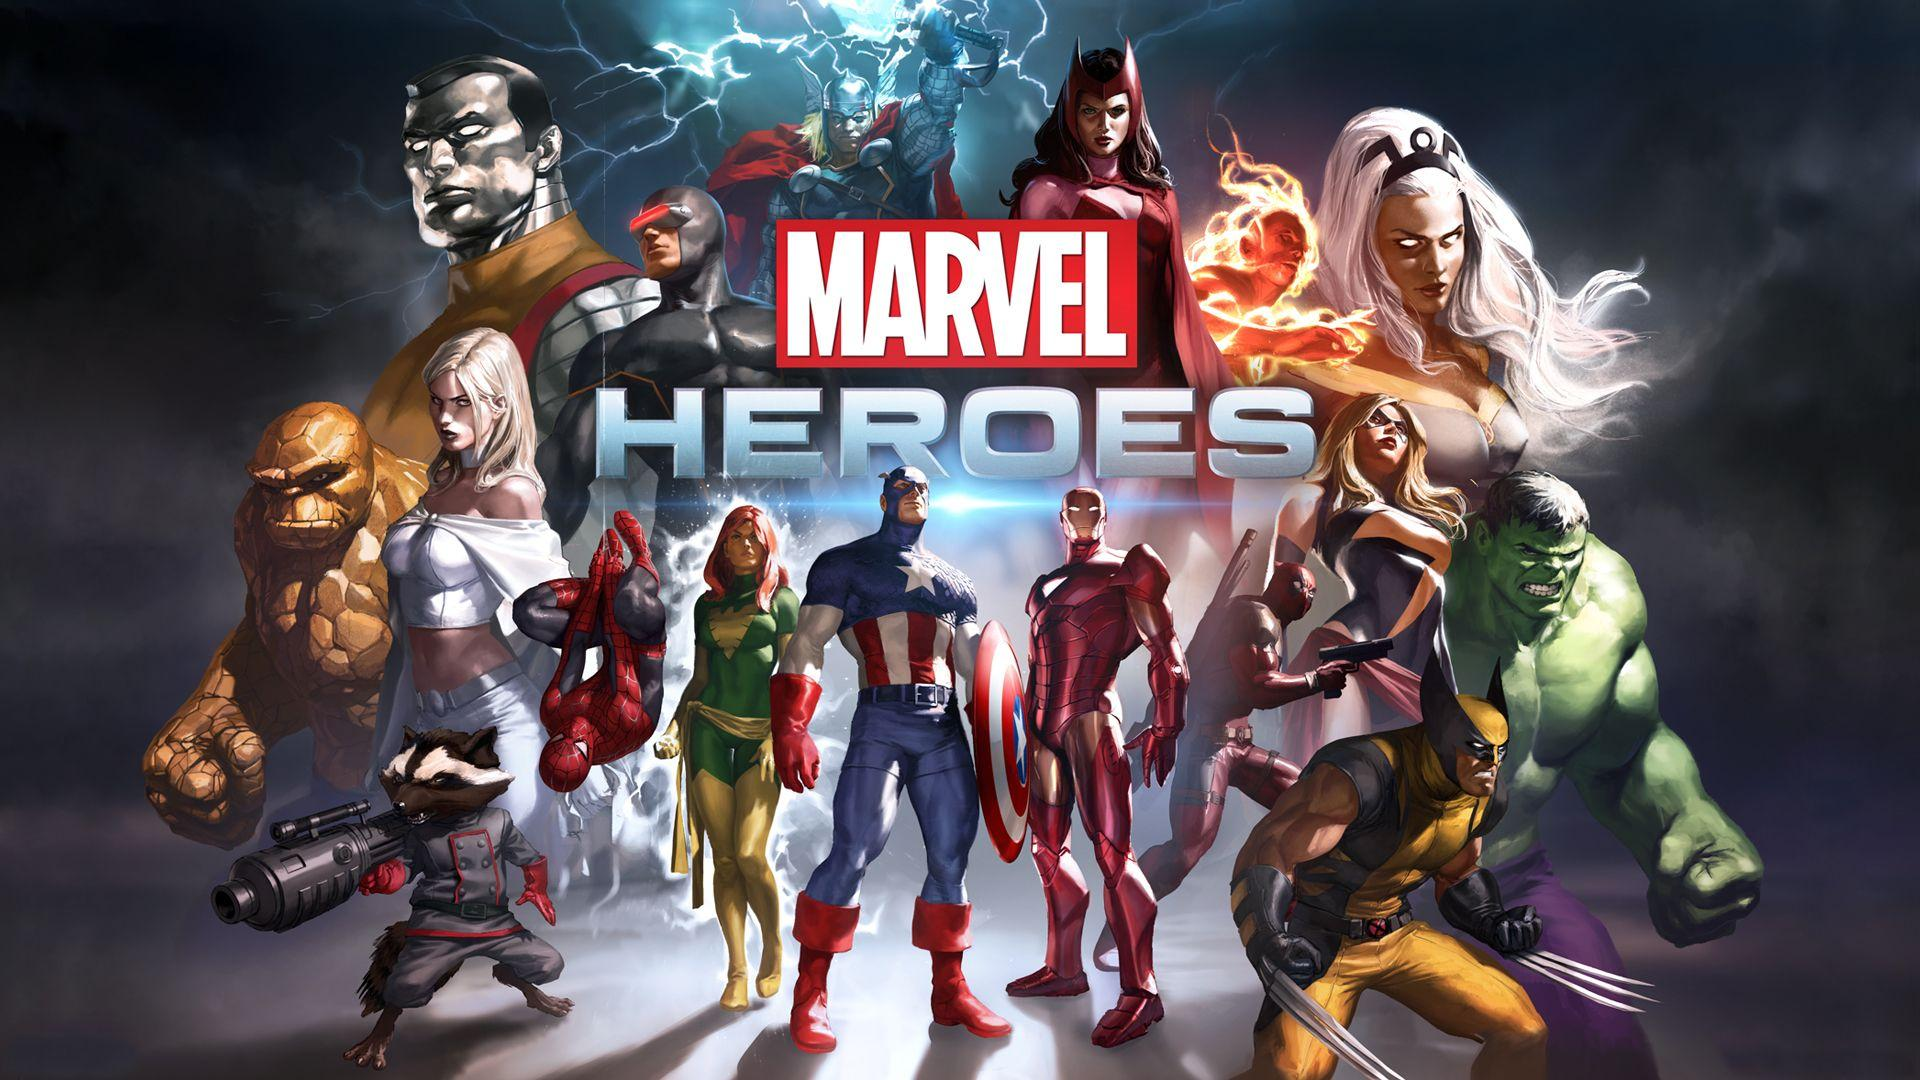 Marvel Heroes Wallpapers Hd Wallpaper Cave